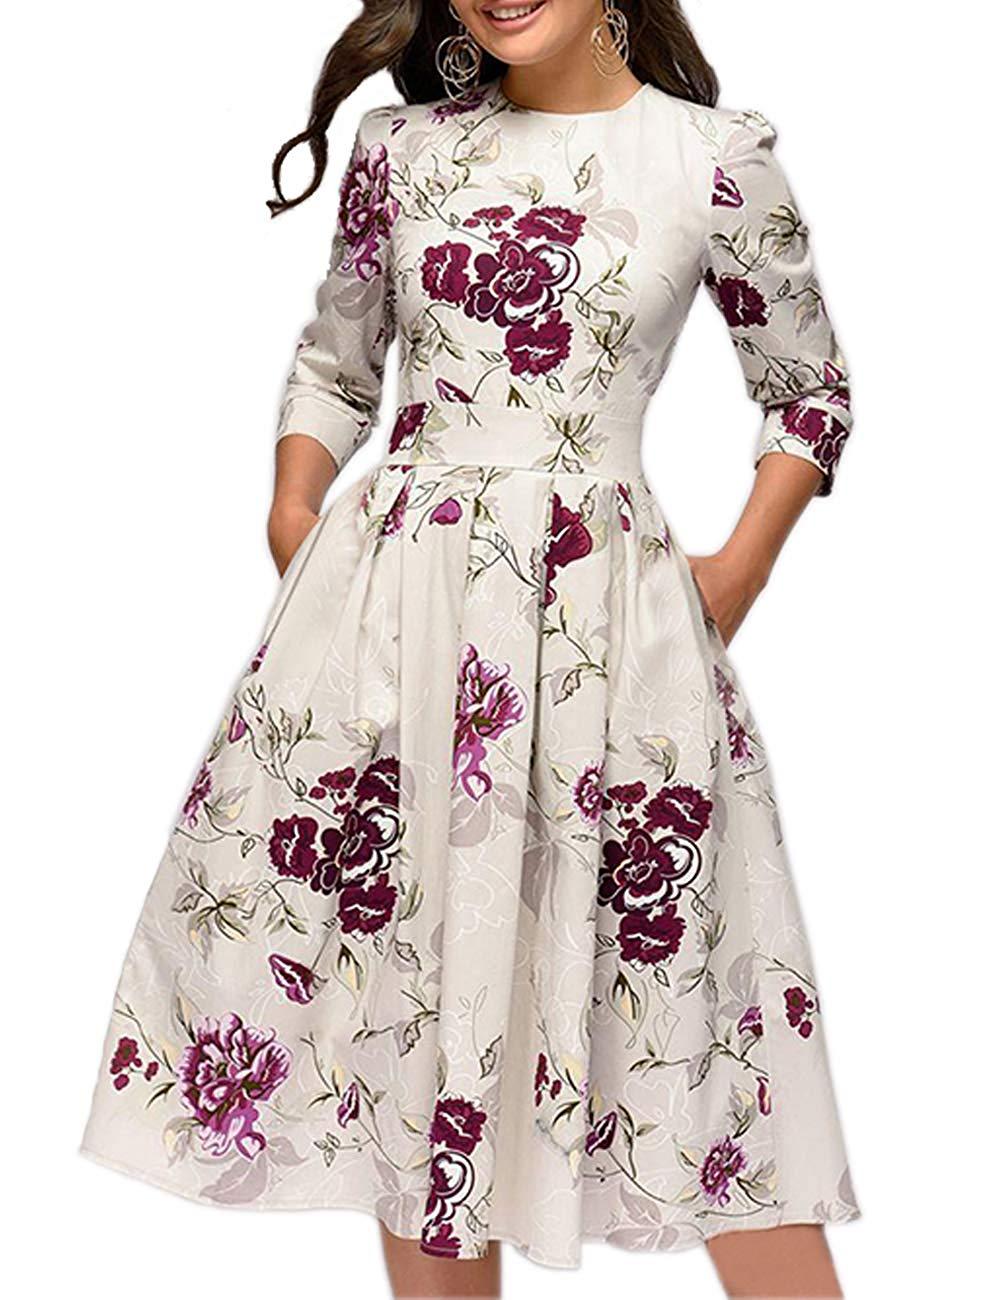 Women's Floral Vintage Dress - golden birthday gift ideas for her